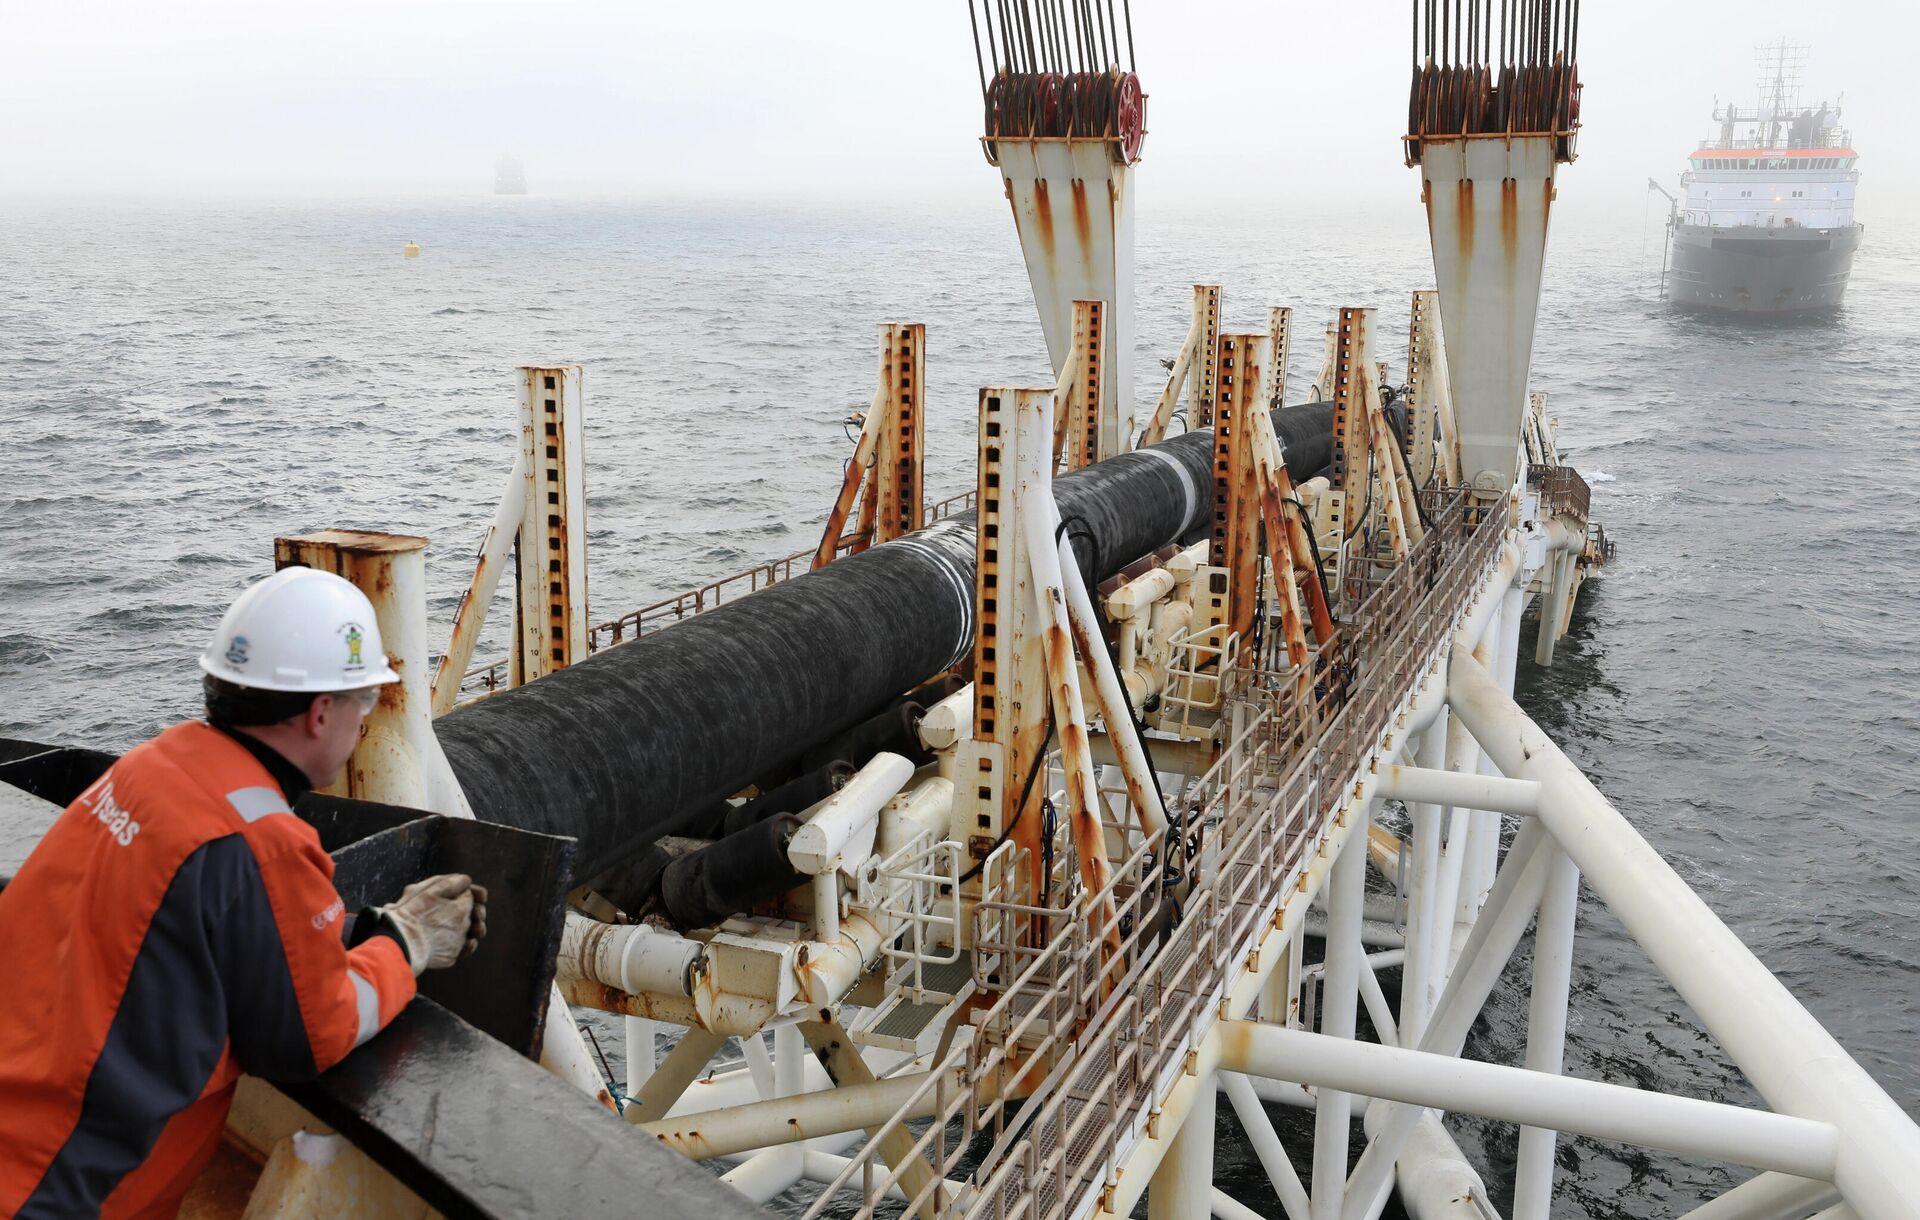 Cотрудник компании Allseas на судне Audacia во время прокладки газопровода Nord Stream 2 - РИА Новости, 1920, 25.09.2020